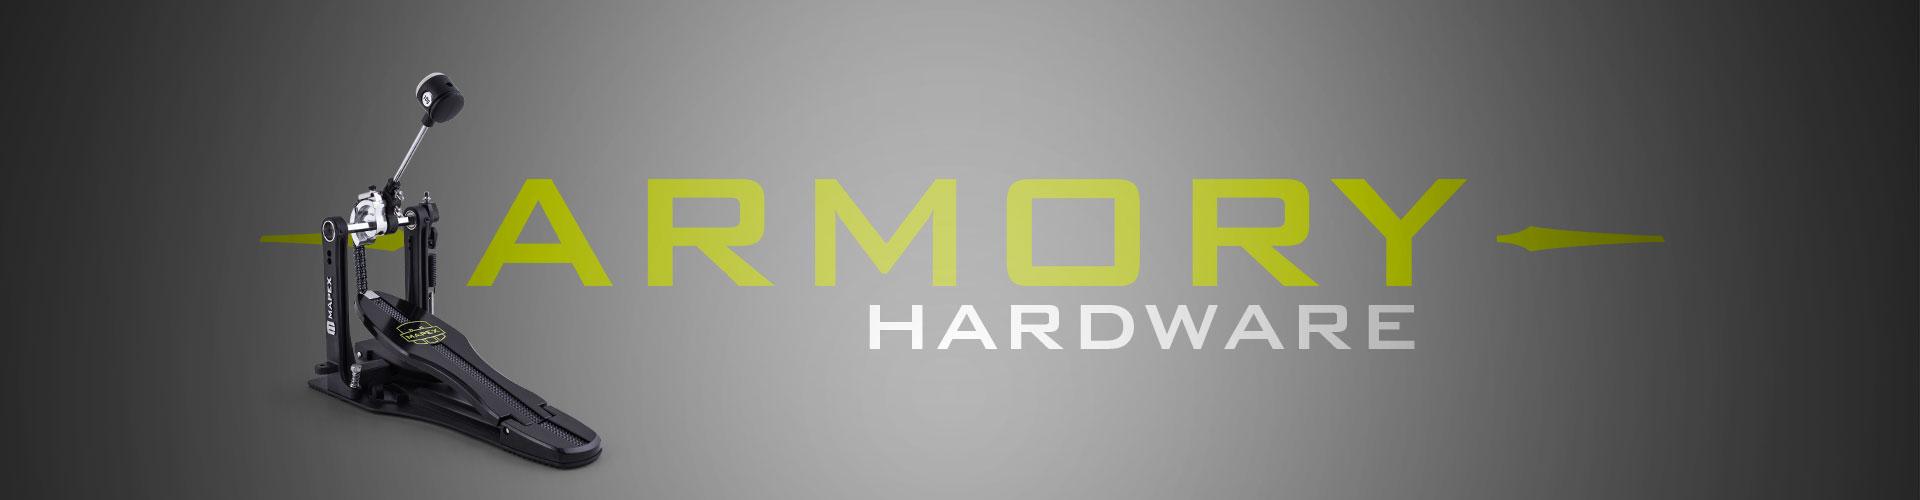 Armory Hardware